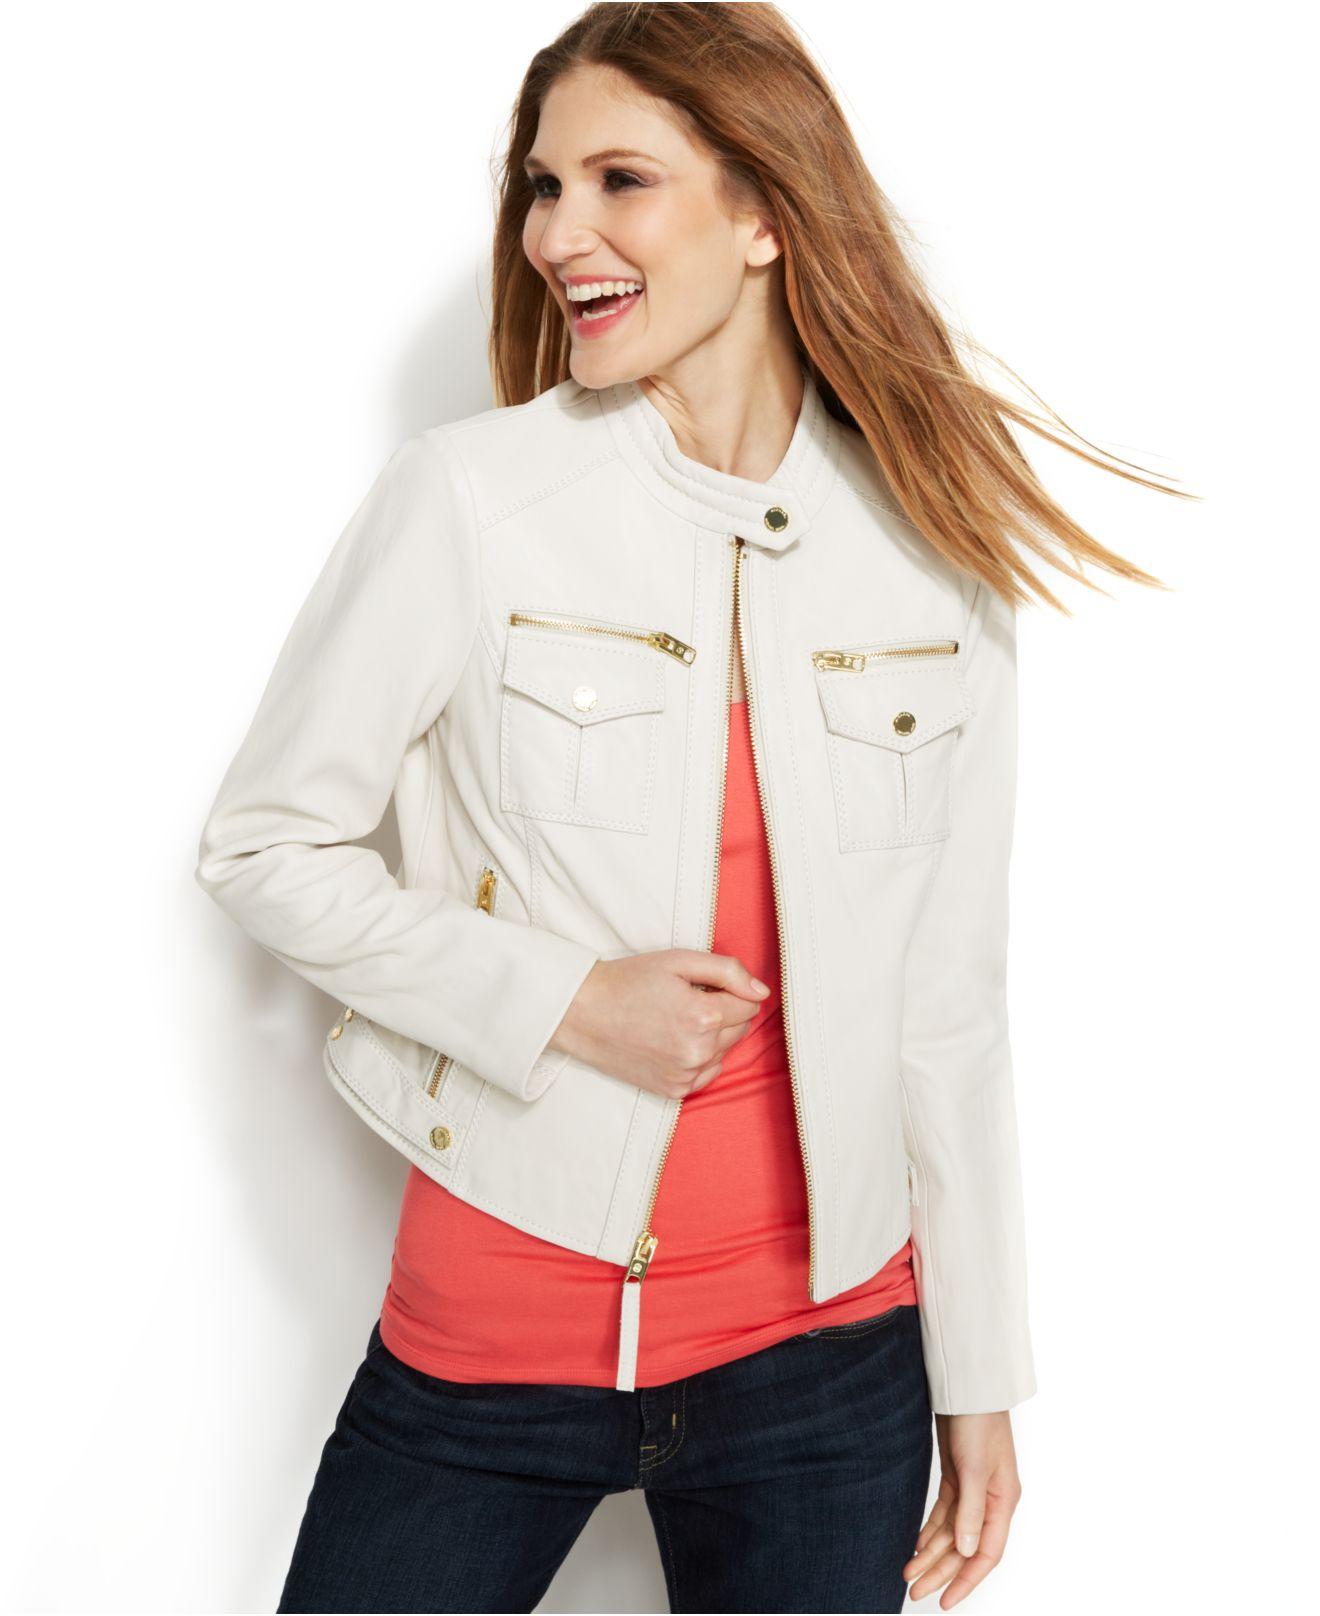 2409534e7247 Lyst - Michael Kors Michael Petite Leather Moto Jacket in White